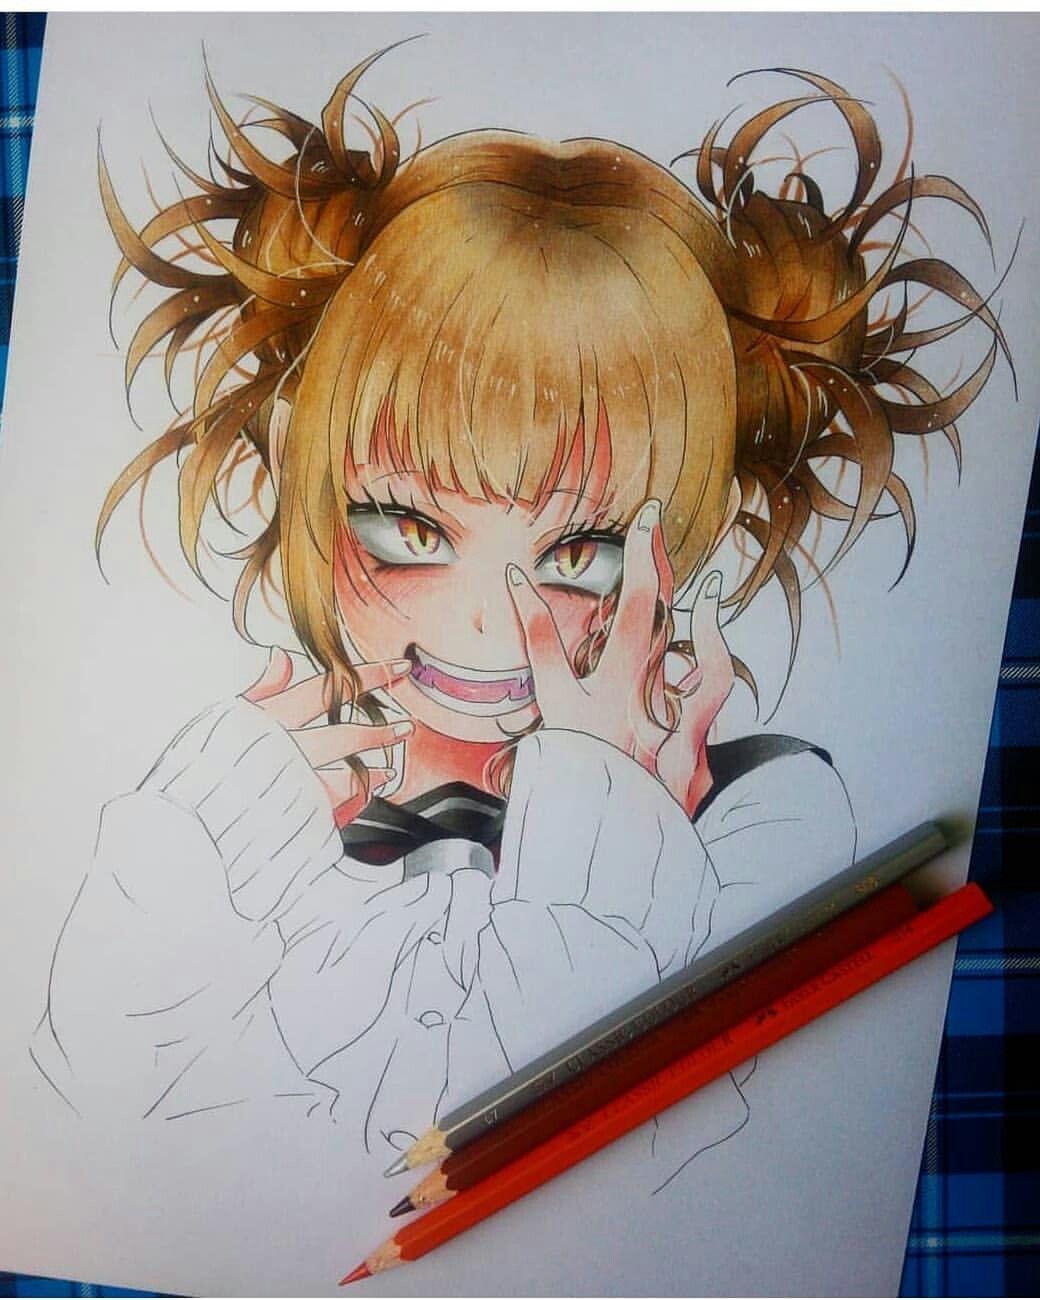 Pin by Bri on Boku no hero   Yandere anime, Anime, Anime